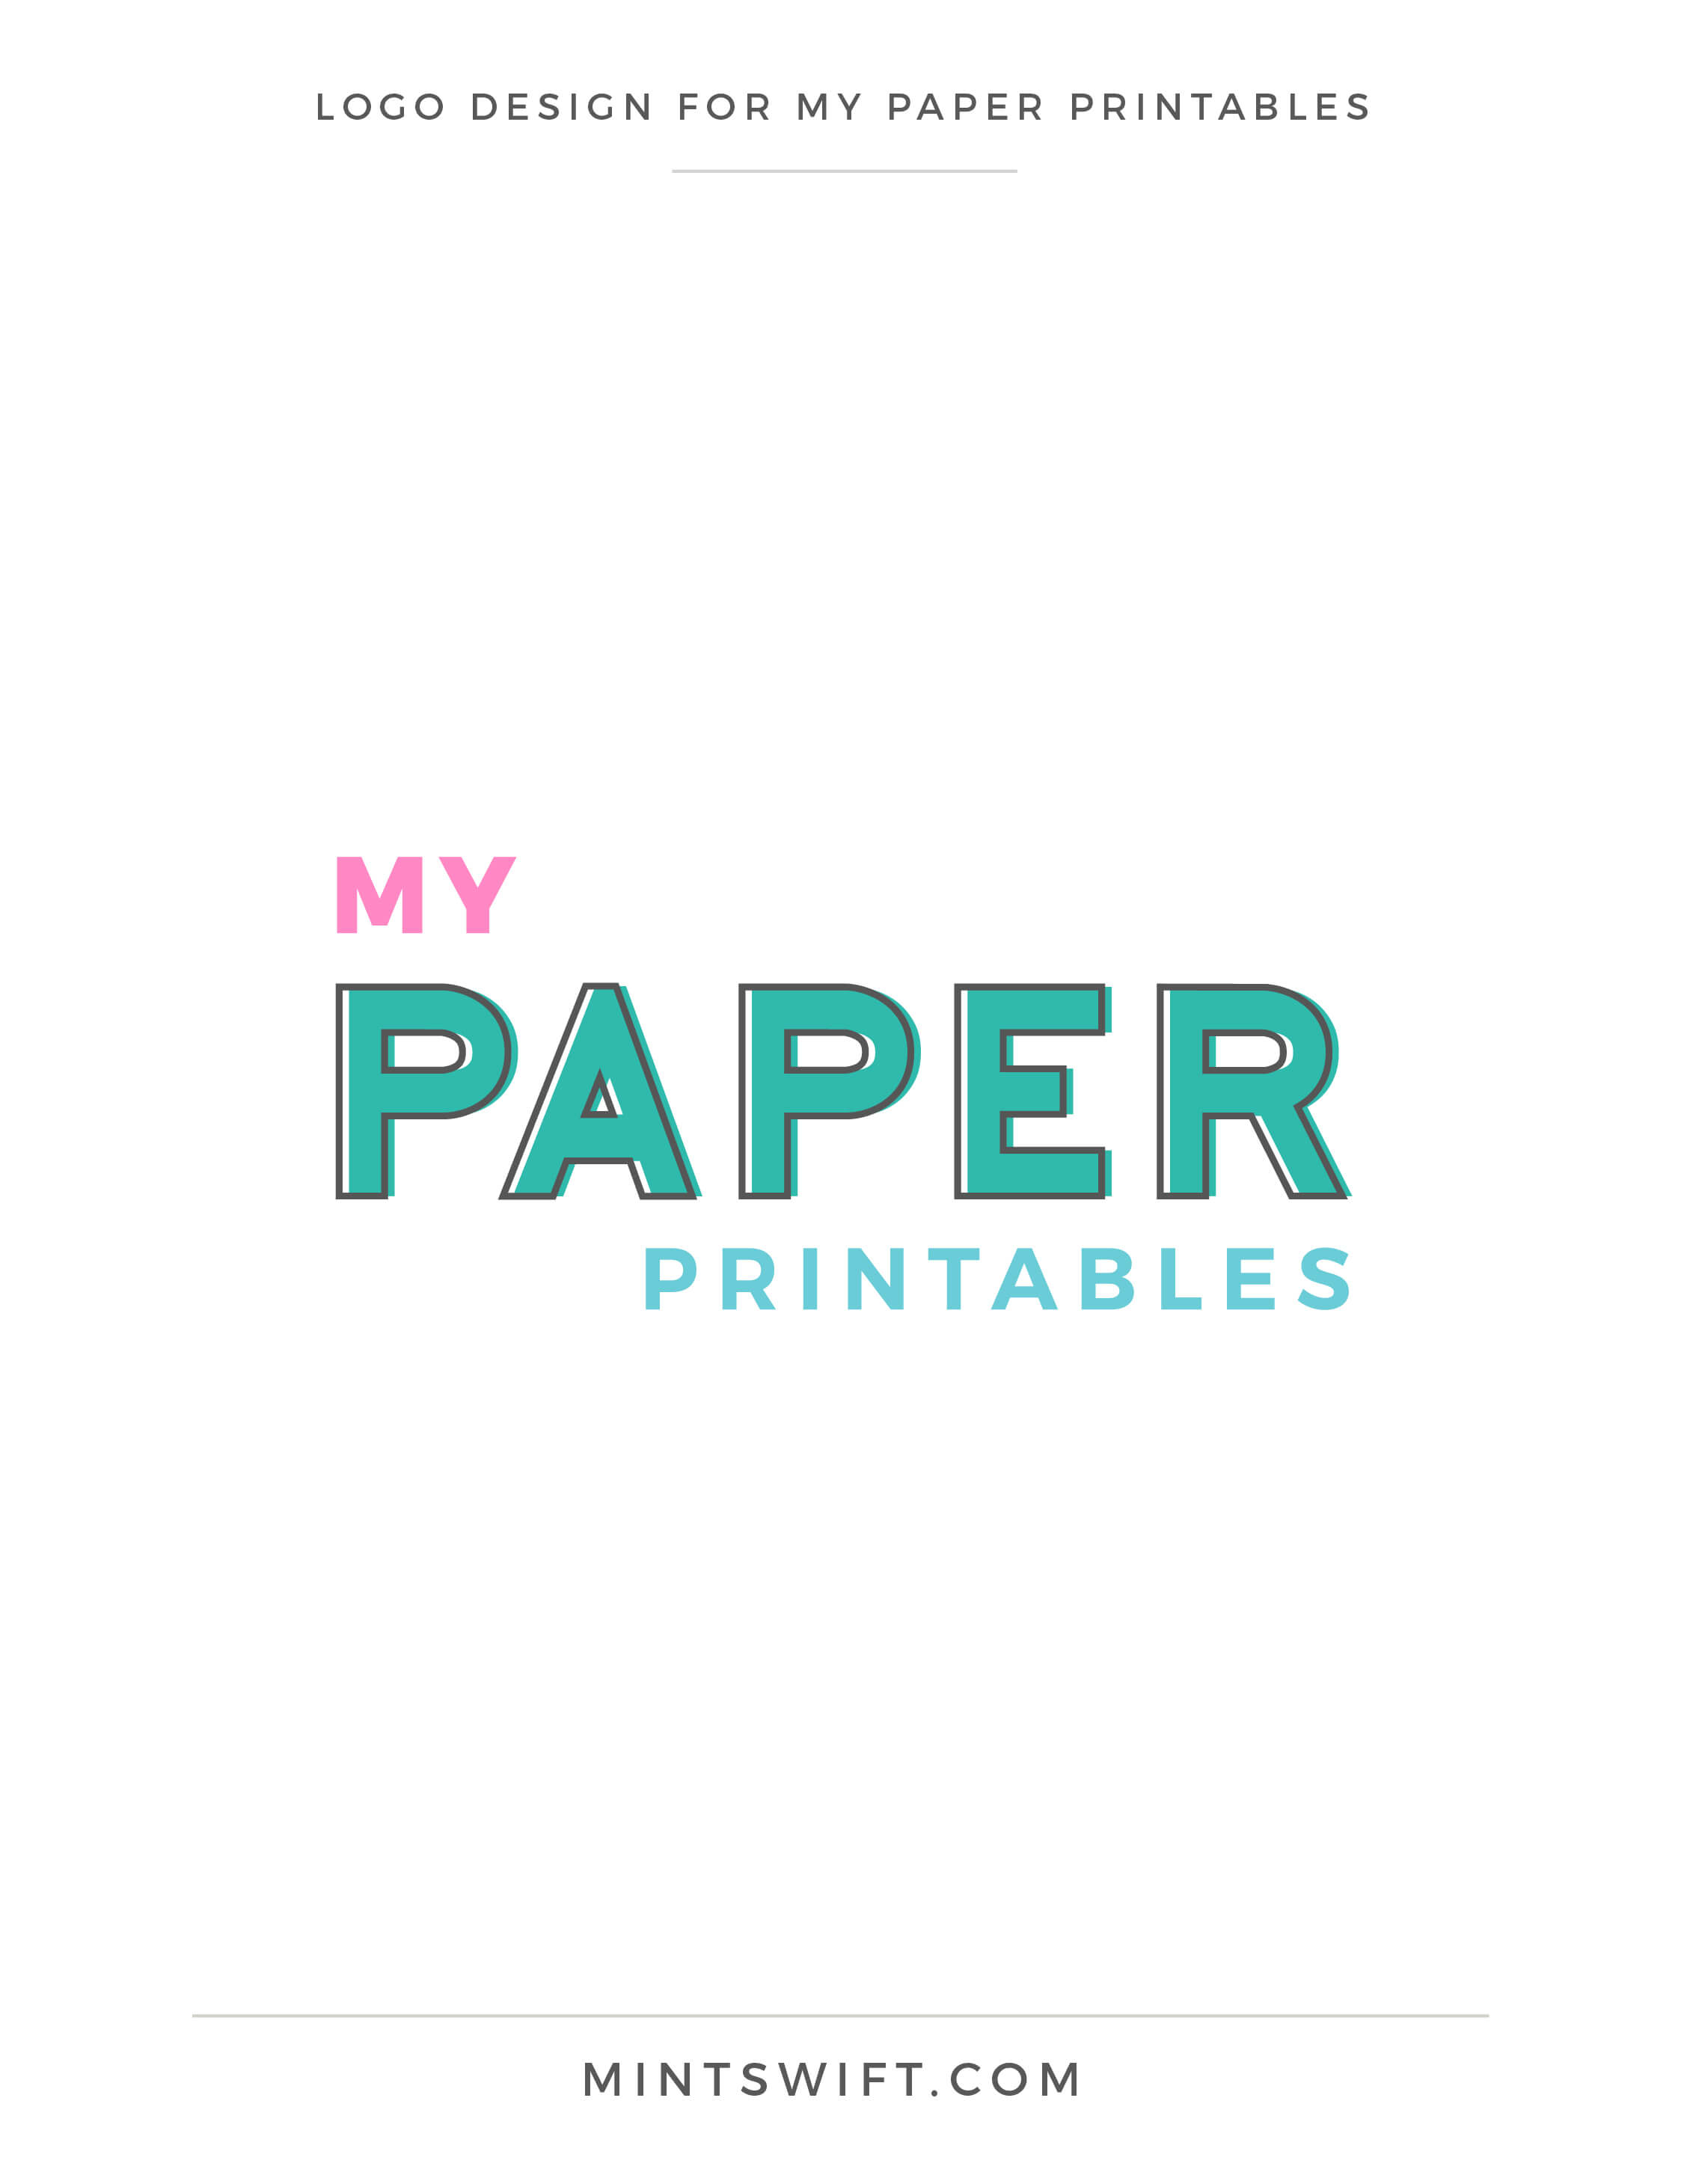 My Paper Printables - Logo Design - Brand Design - MintSwift